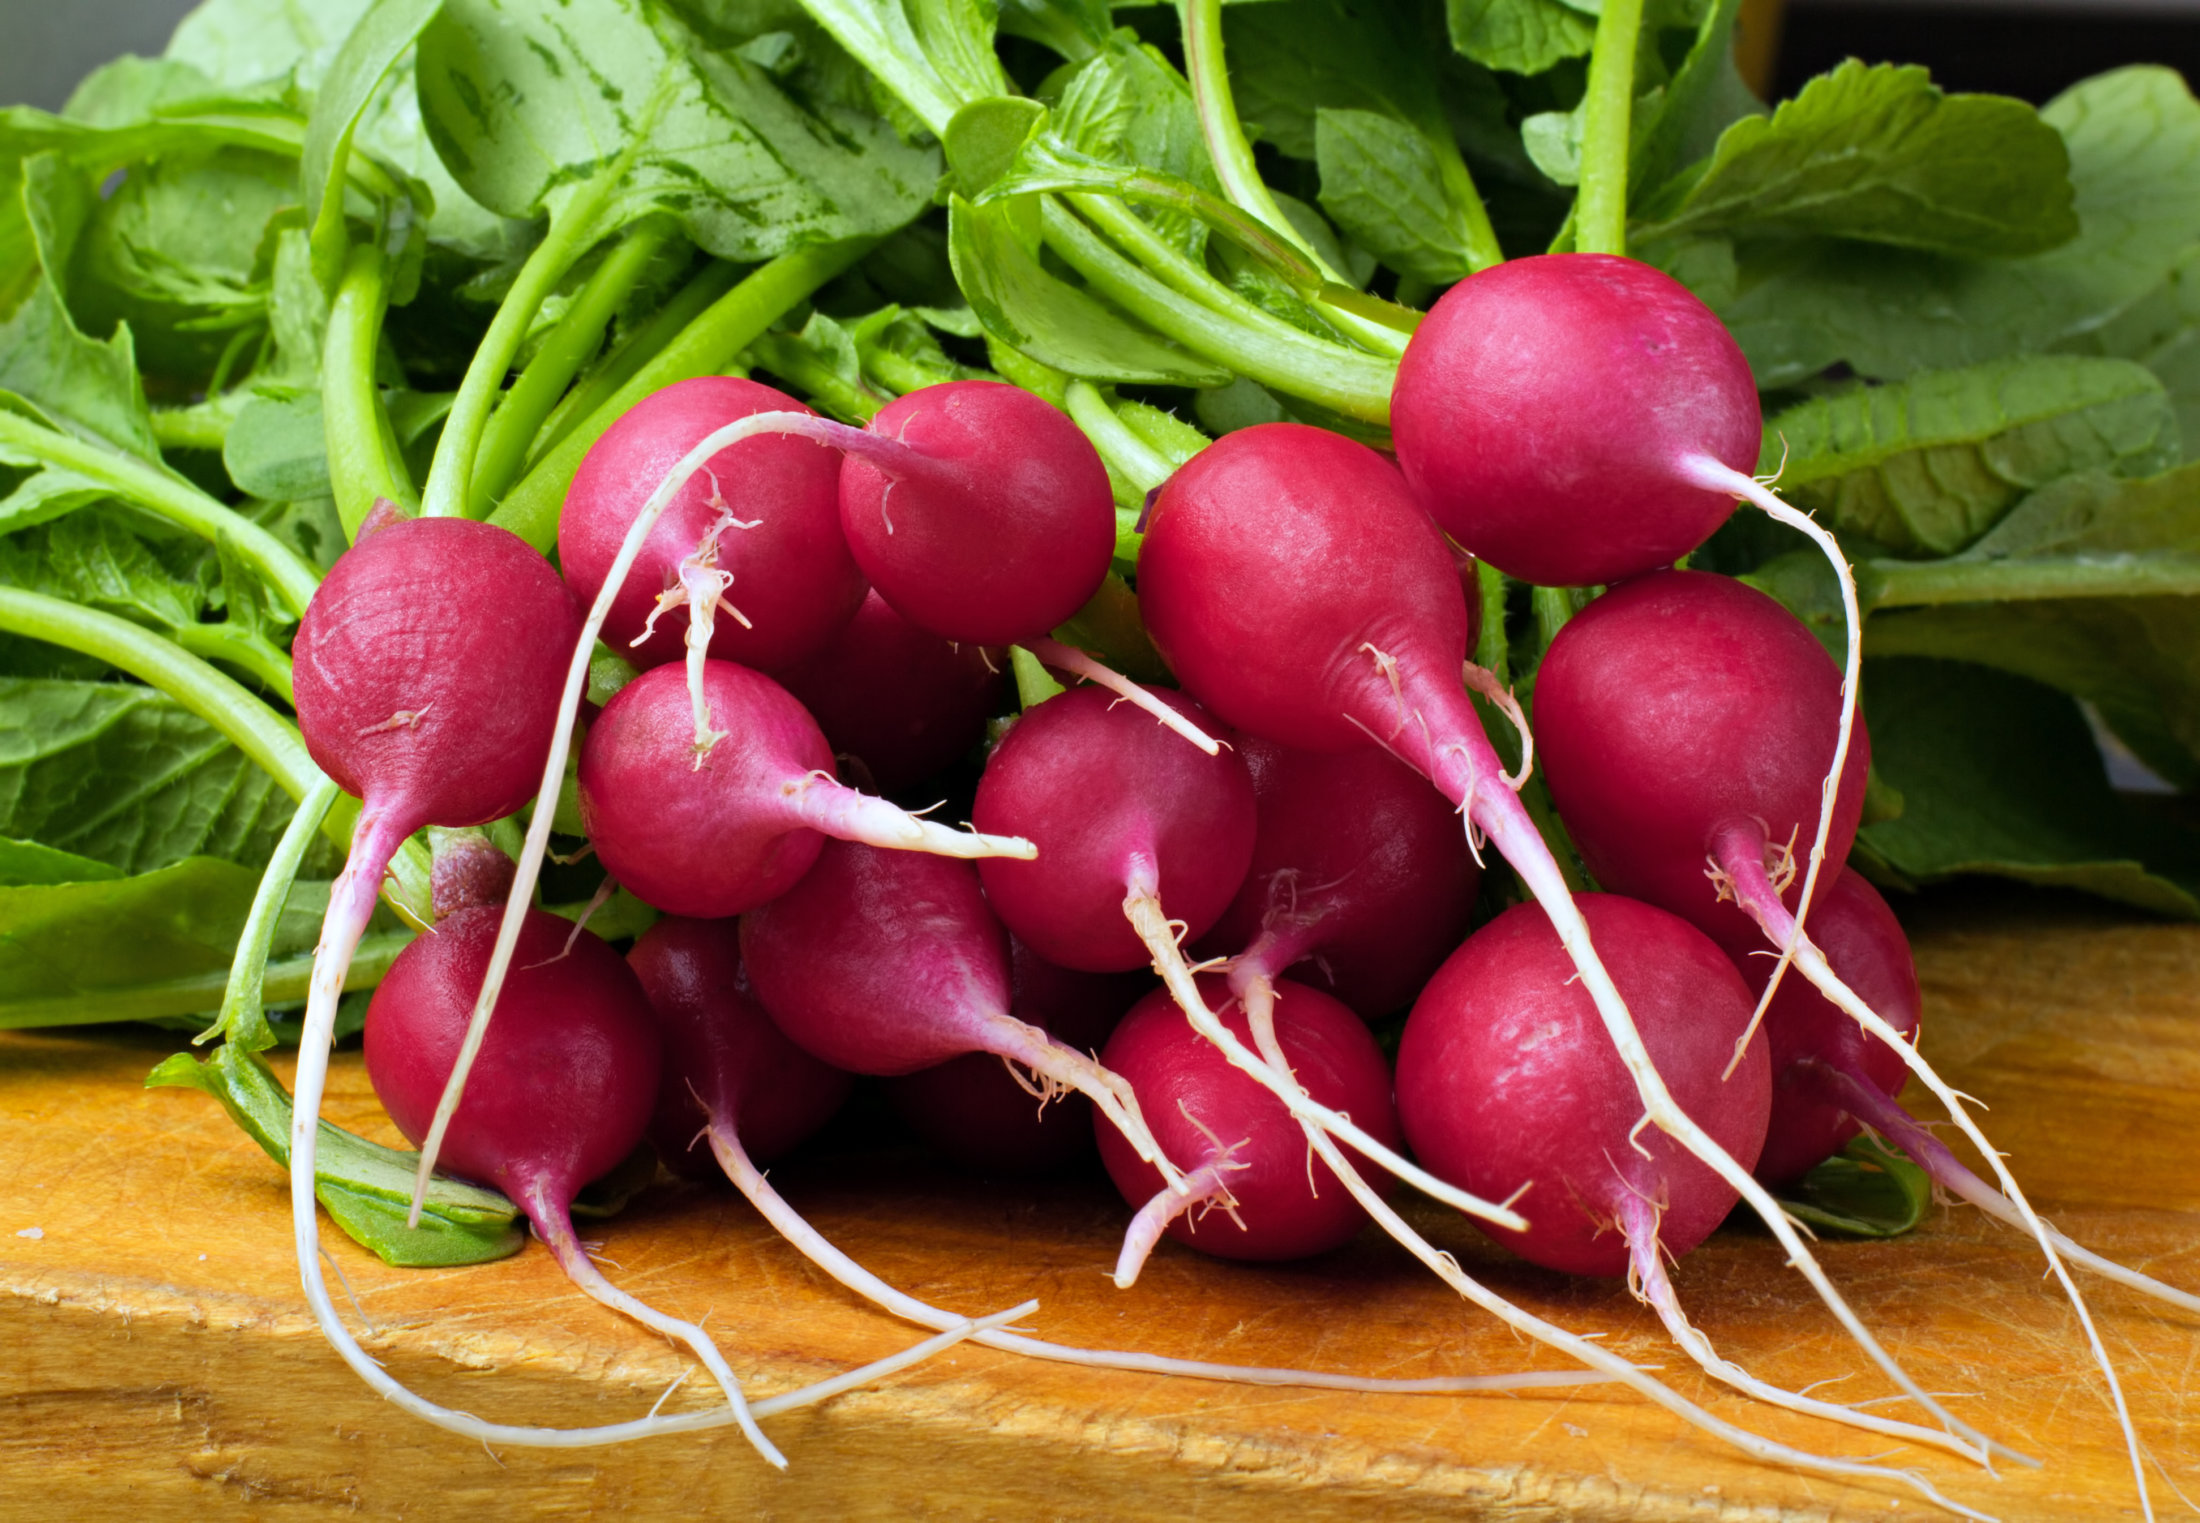 raízes comestíveis : alimentos caule